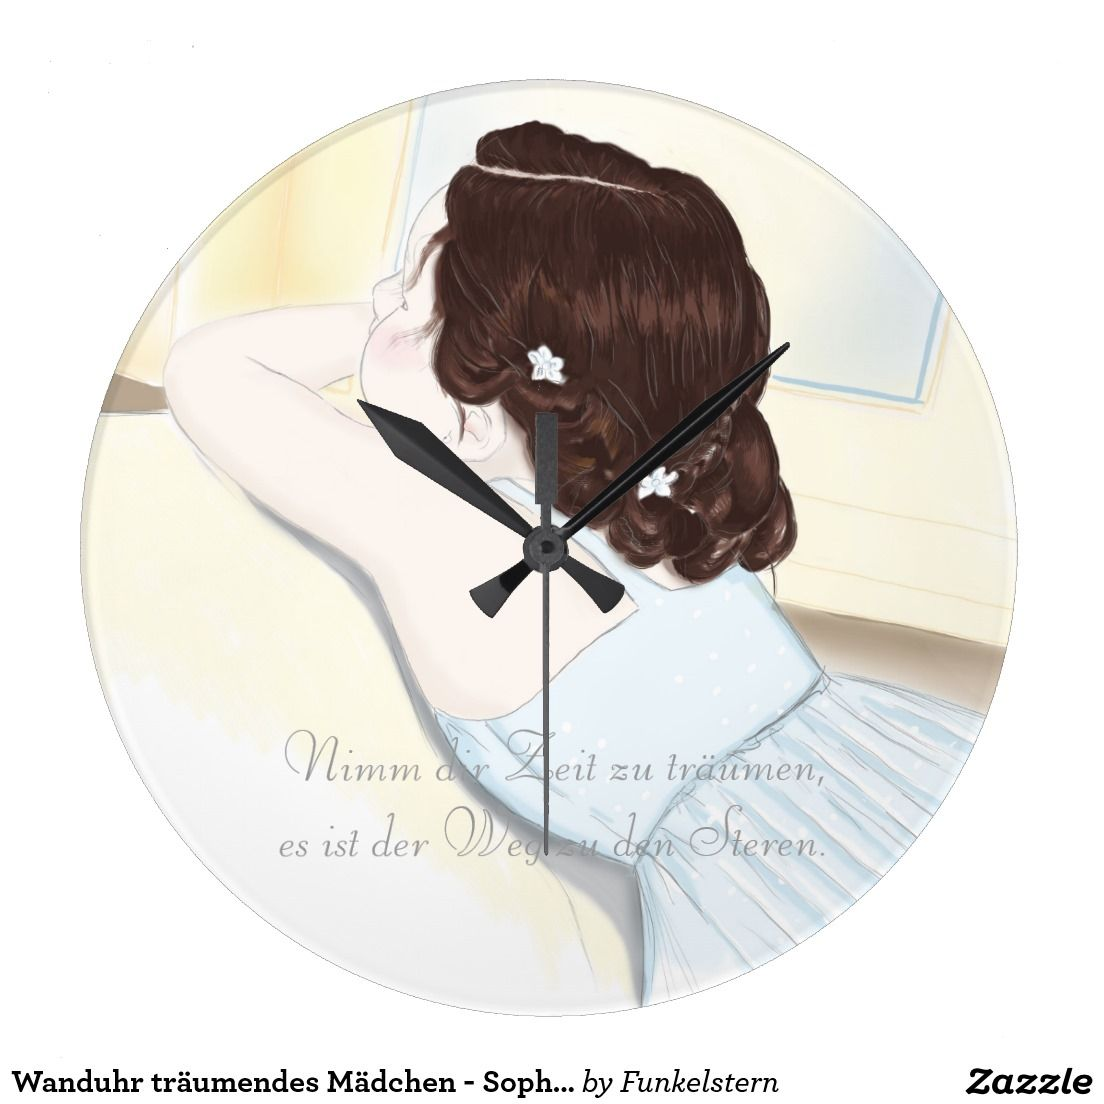 Wanduhr träumendes Mädchen - Sophia